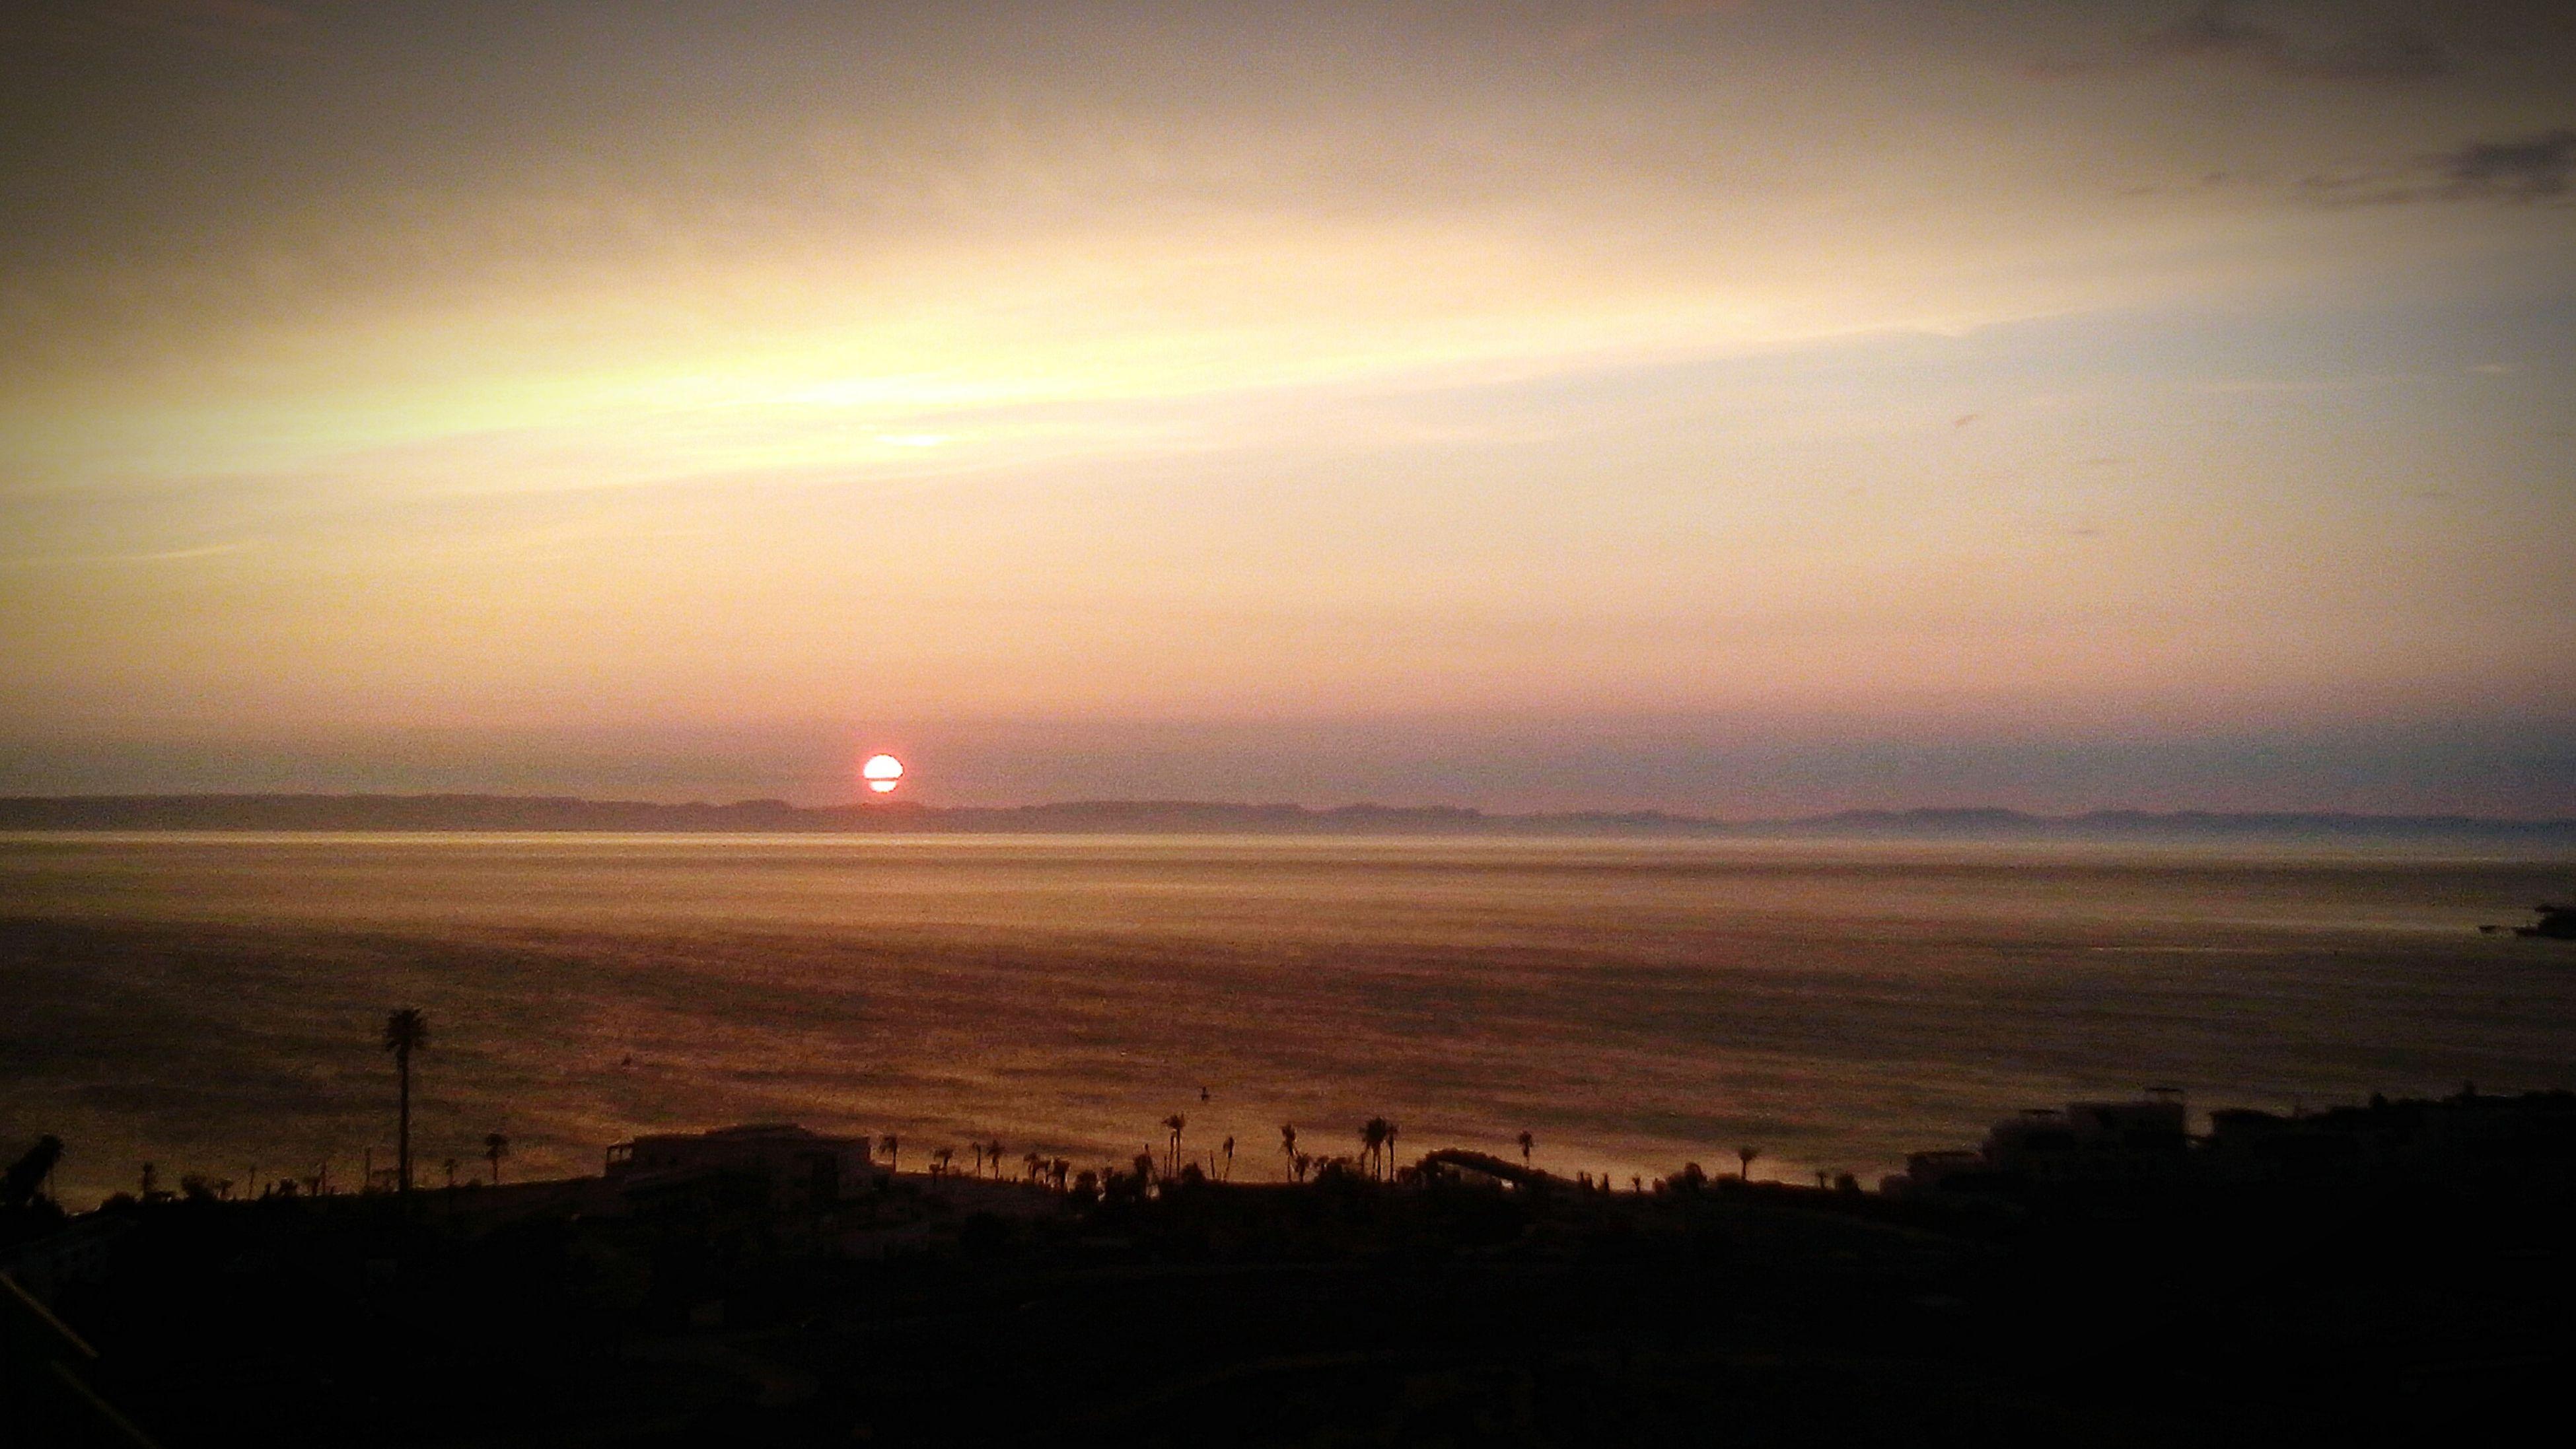 sunset, tranquil scene, tranquility, scenics, silhouette, beauty in nature, sky, landscape, sun, nature, water, idyllic, field, dusk, orange color, dark, sea, outdoors, non-urban scene, remote